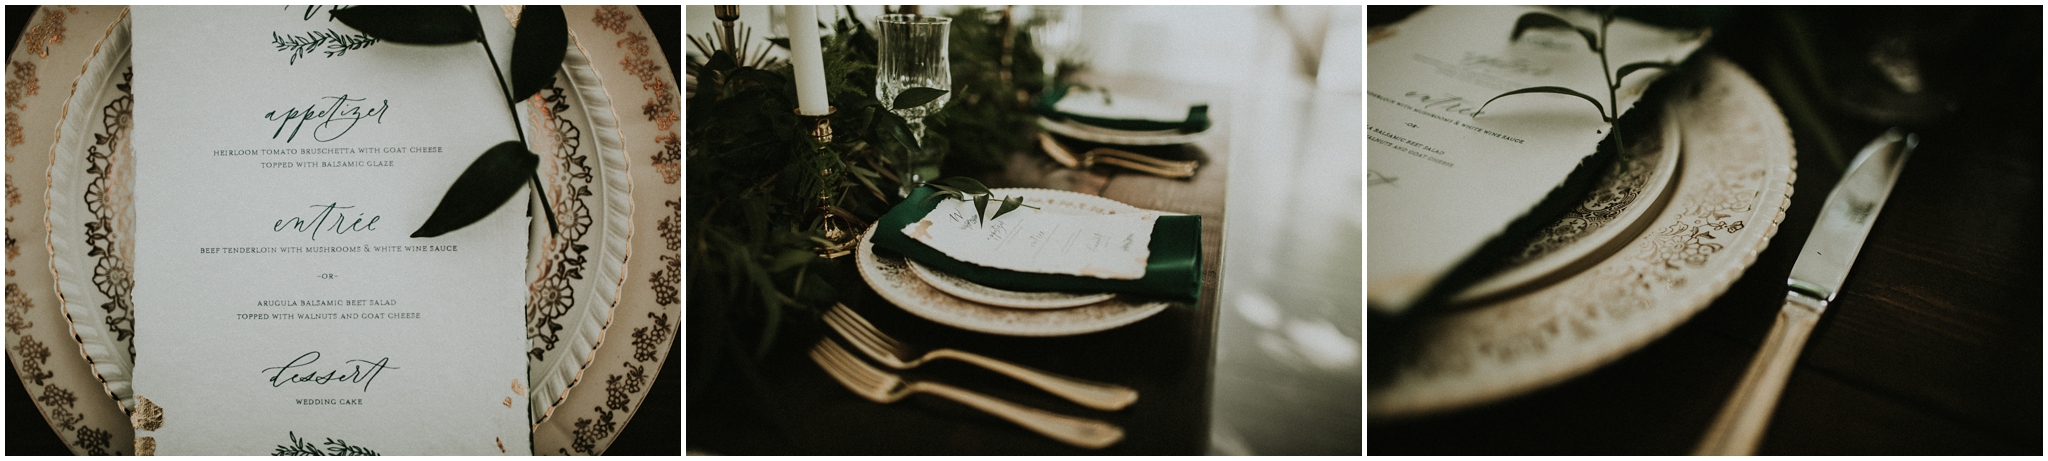 Wedding-photographer-ritchie-hill_0014.jpg